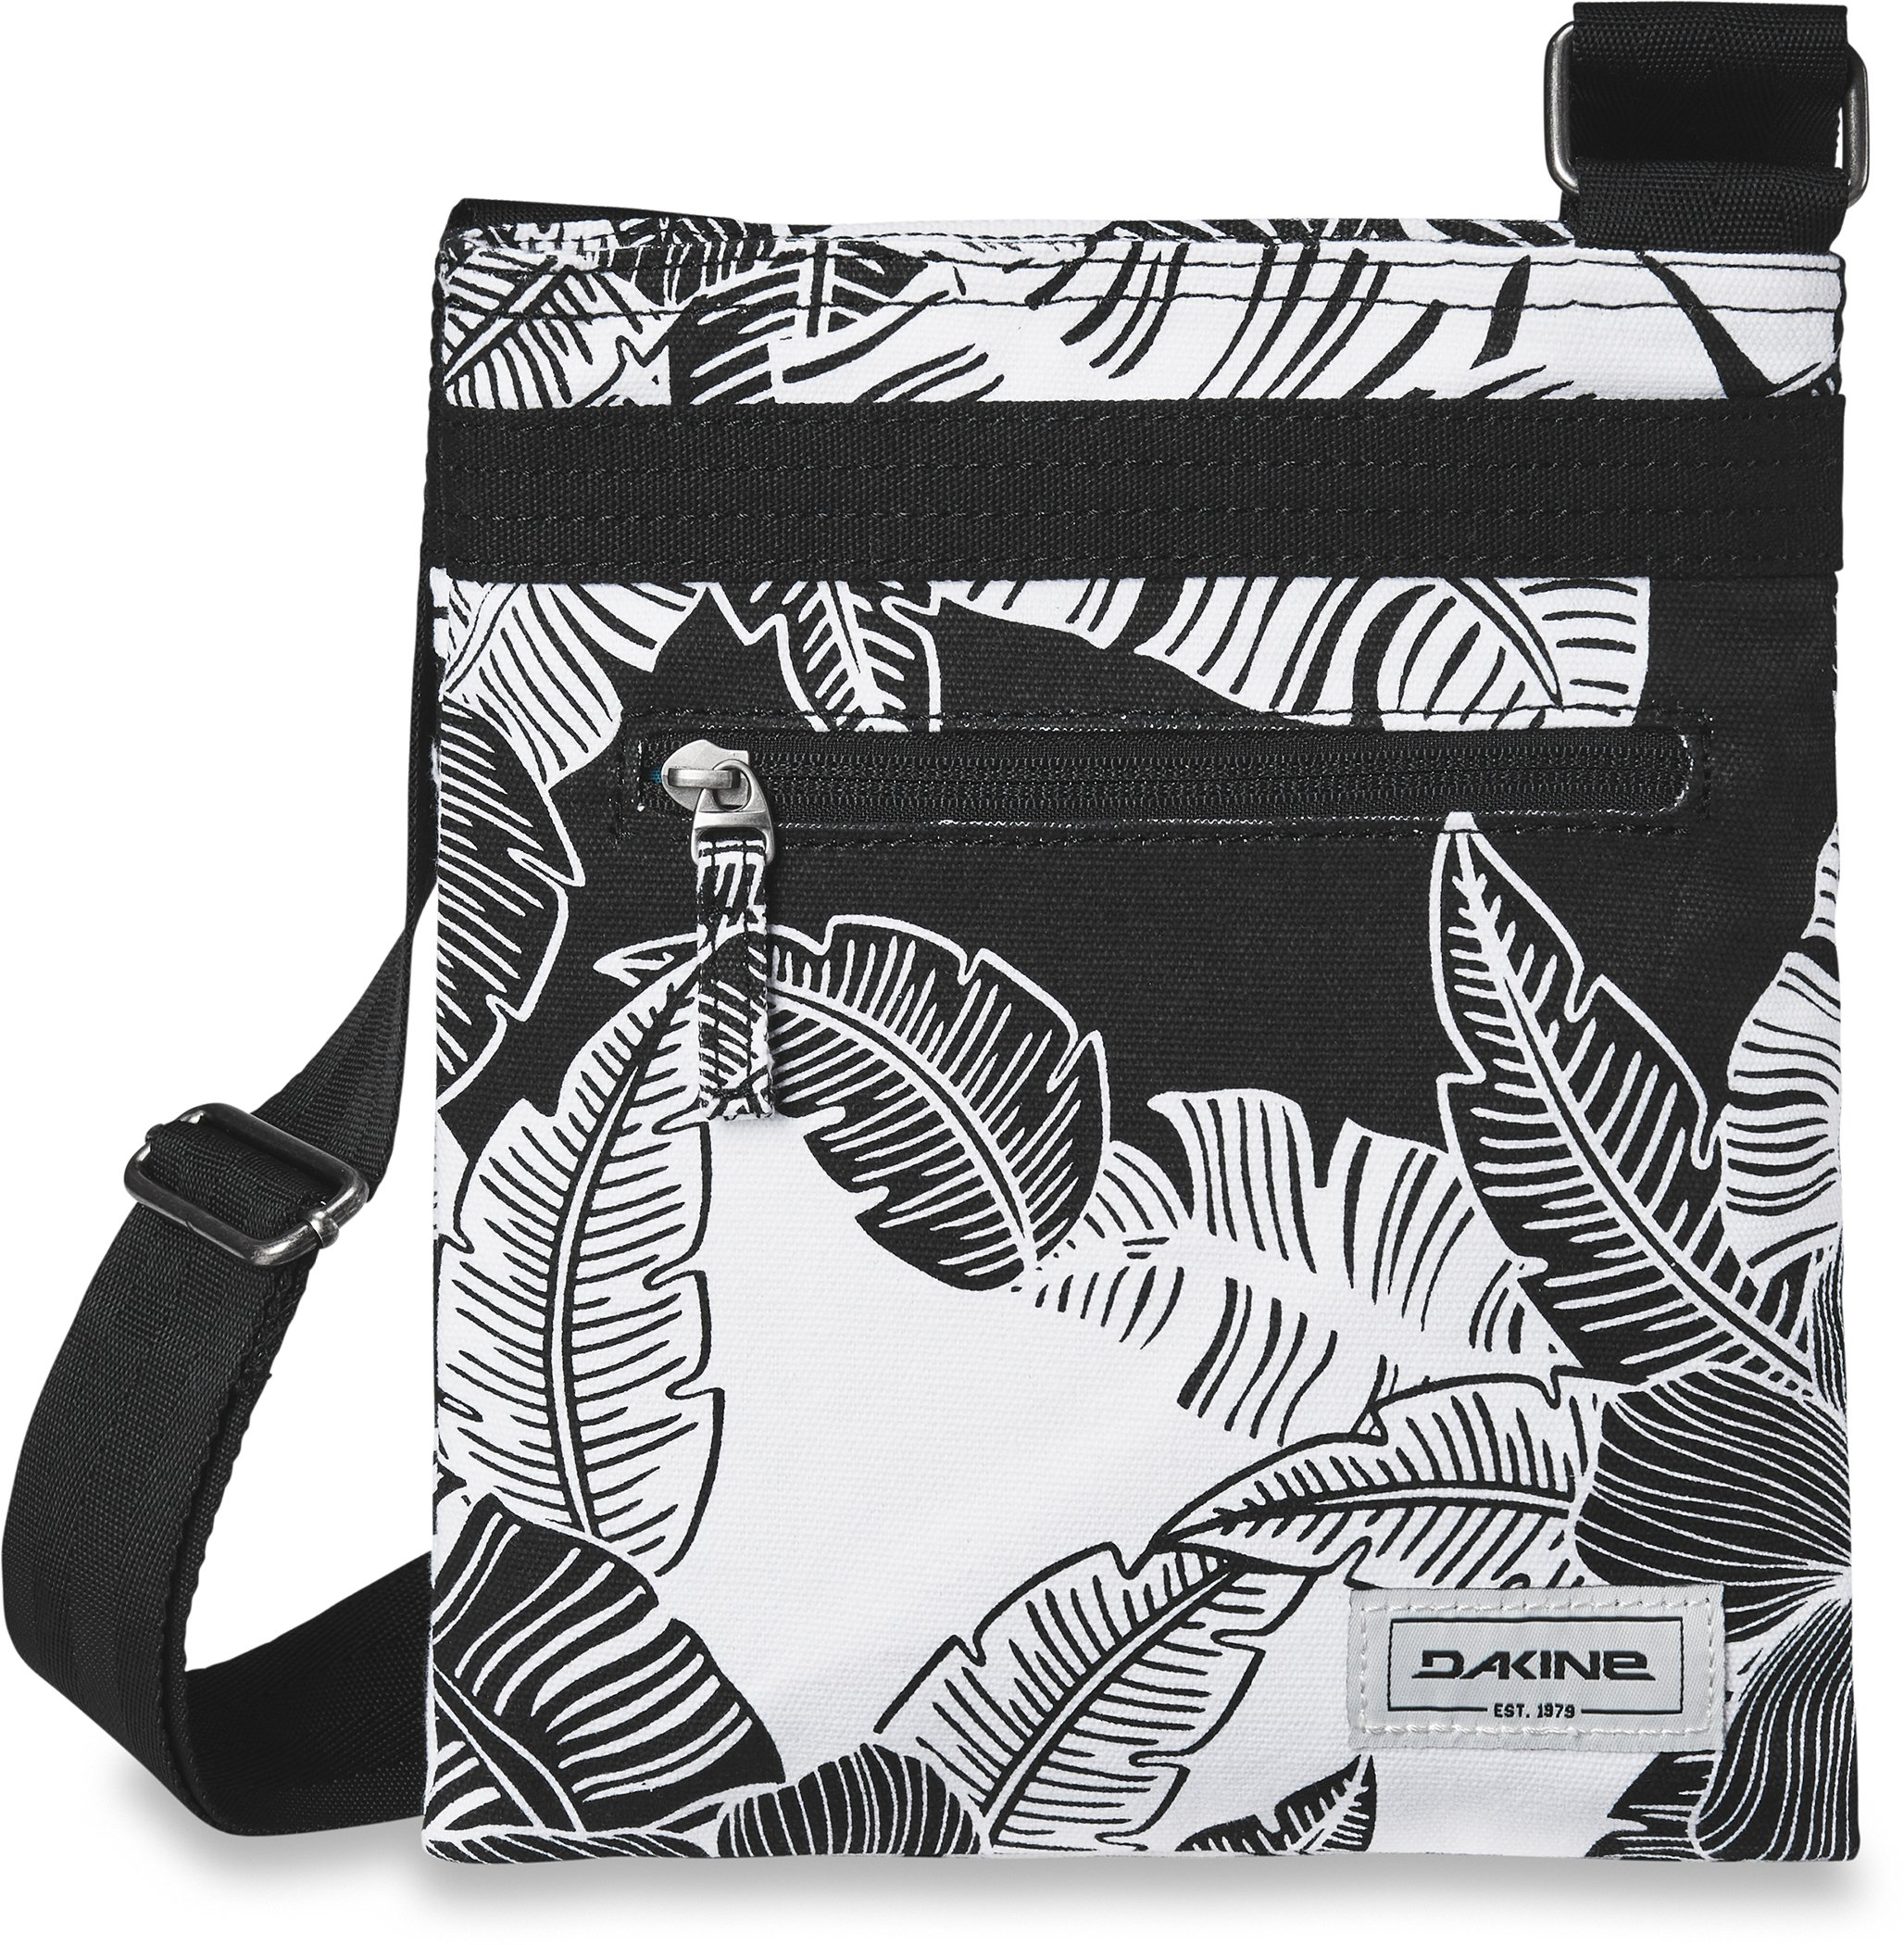 Dakine Women's Jive Canvas Cross Body Bag, Hibiscus Palm Canvas, One Size